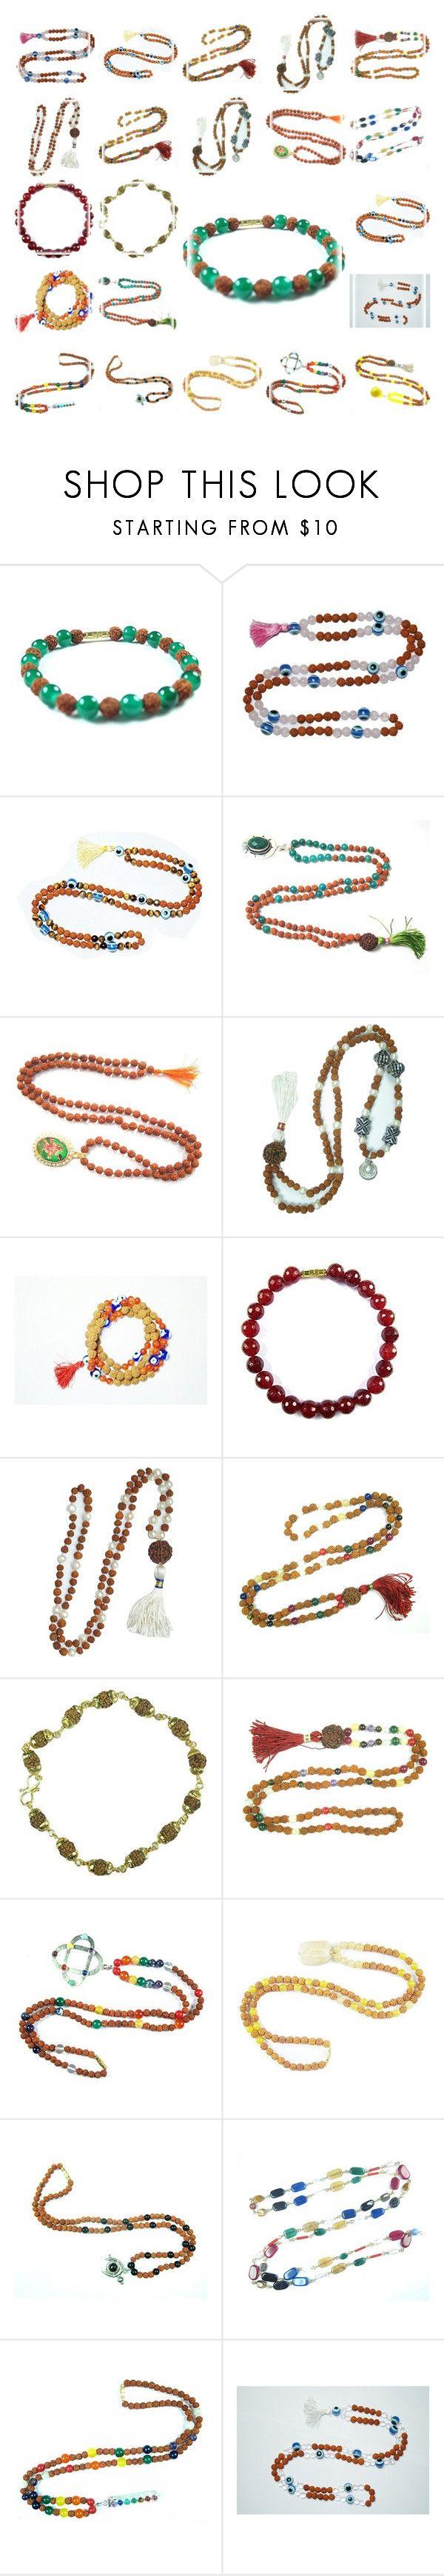 Japamala Beads by tarini-tarini on Polyvore featuring GURU, gift, beads, yoga and japamala